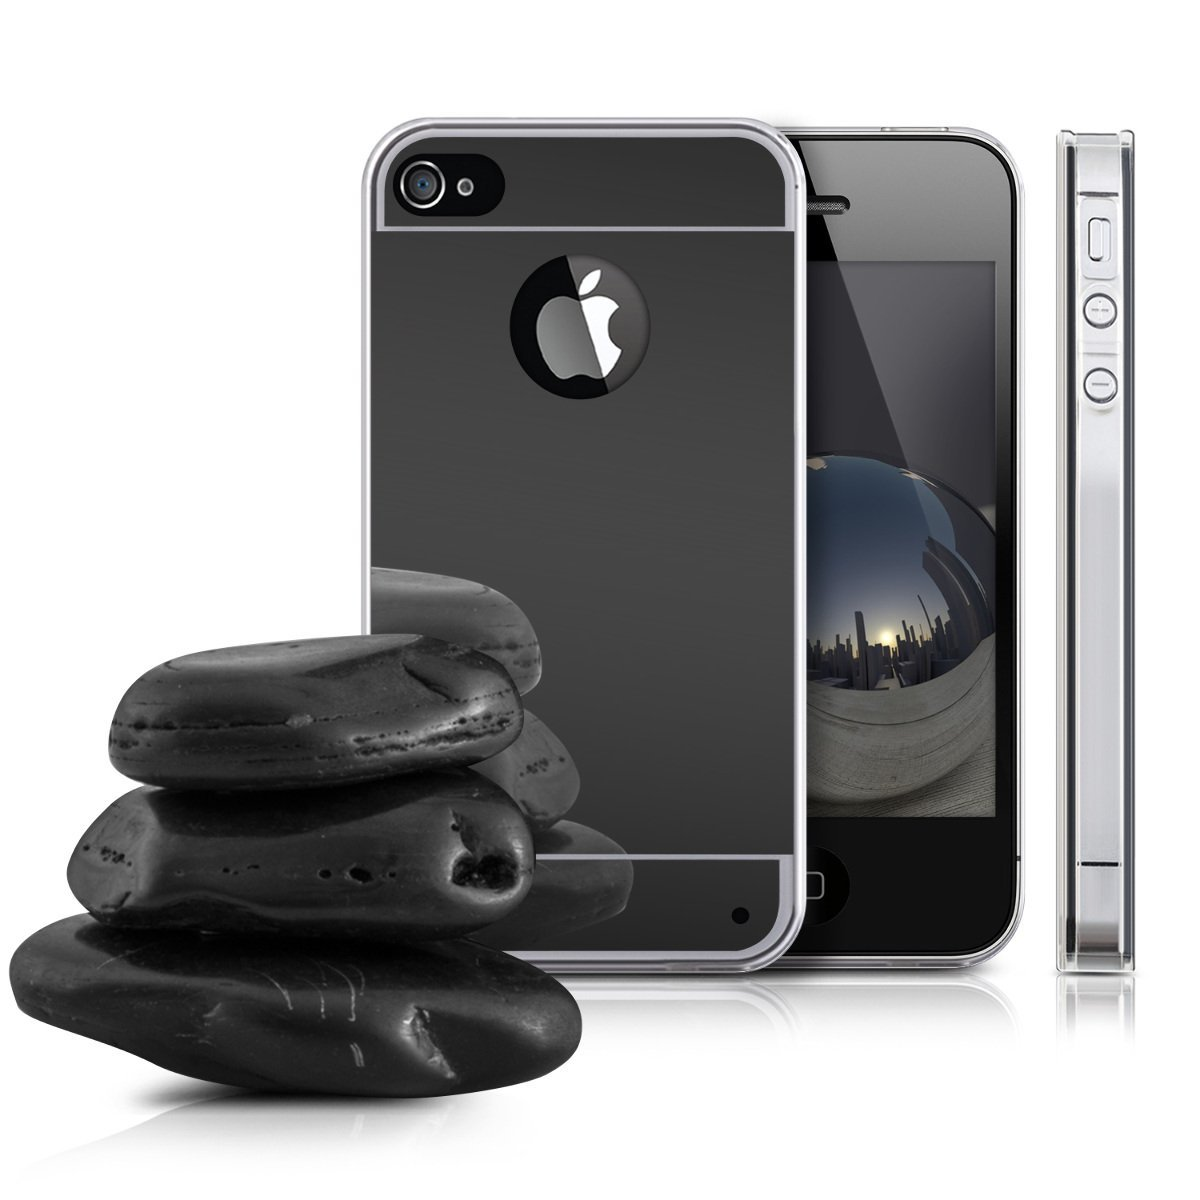 Zrcadlový kryt My Mirror pro iPhone 4s / 4 - Černý (black)